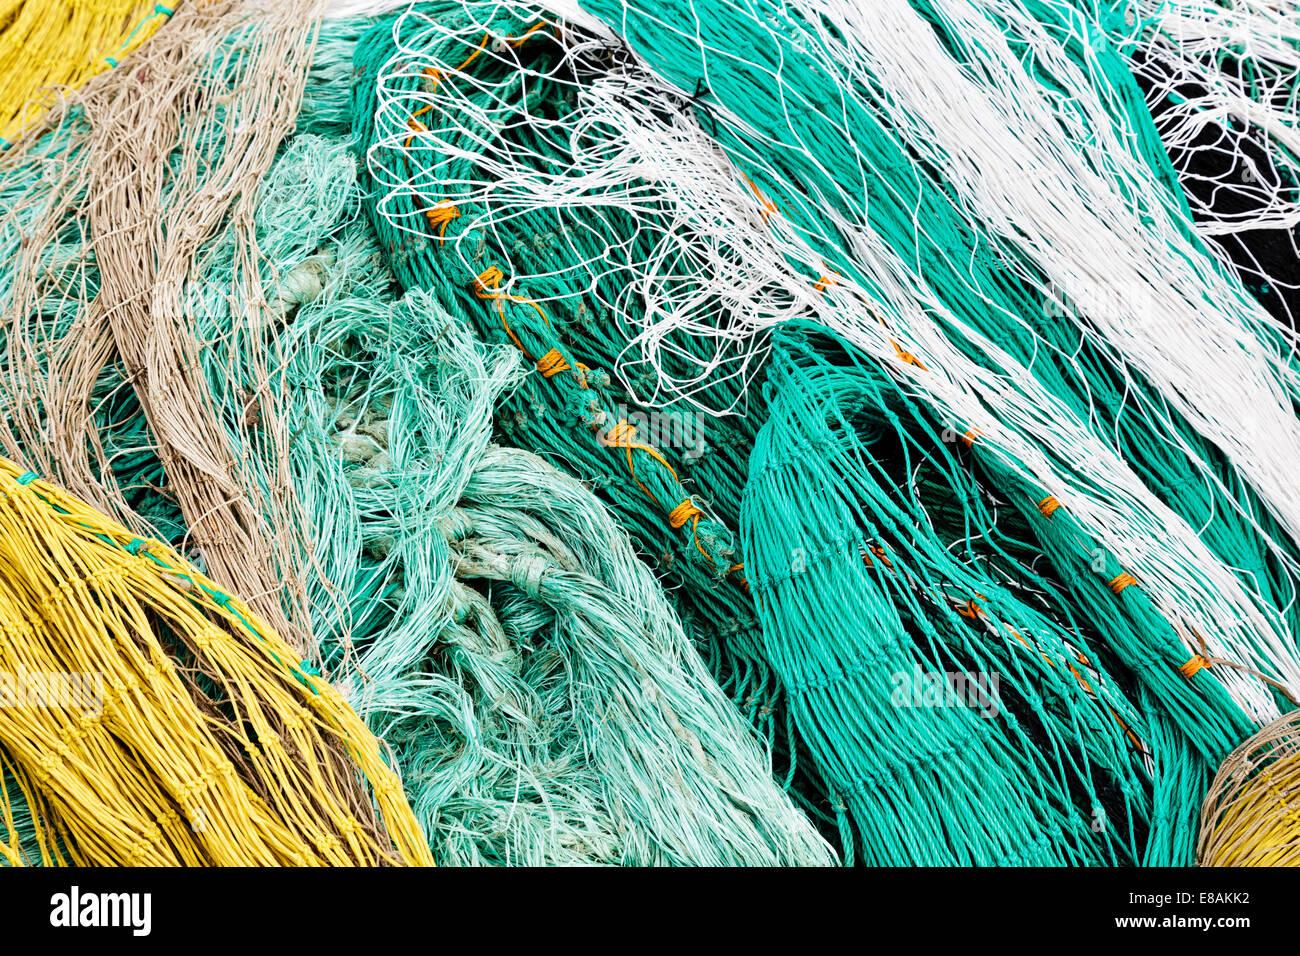 Closeup of varicolored netting - Stock Image